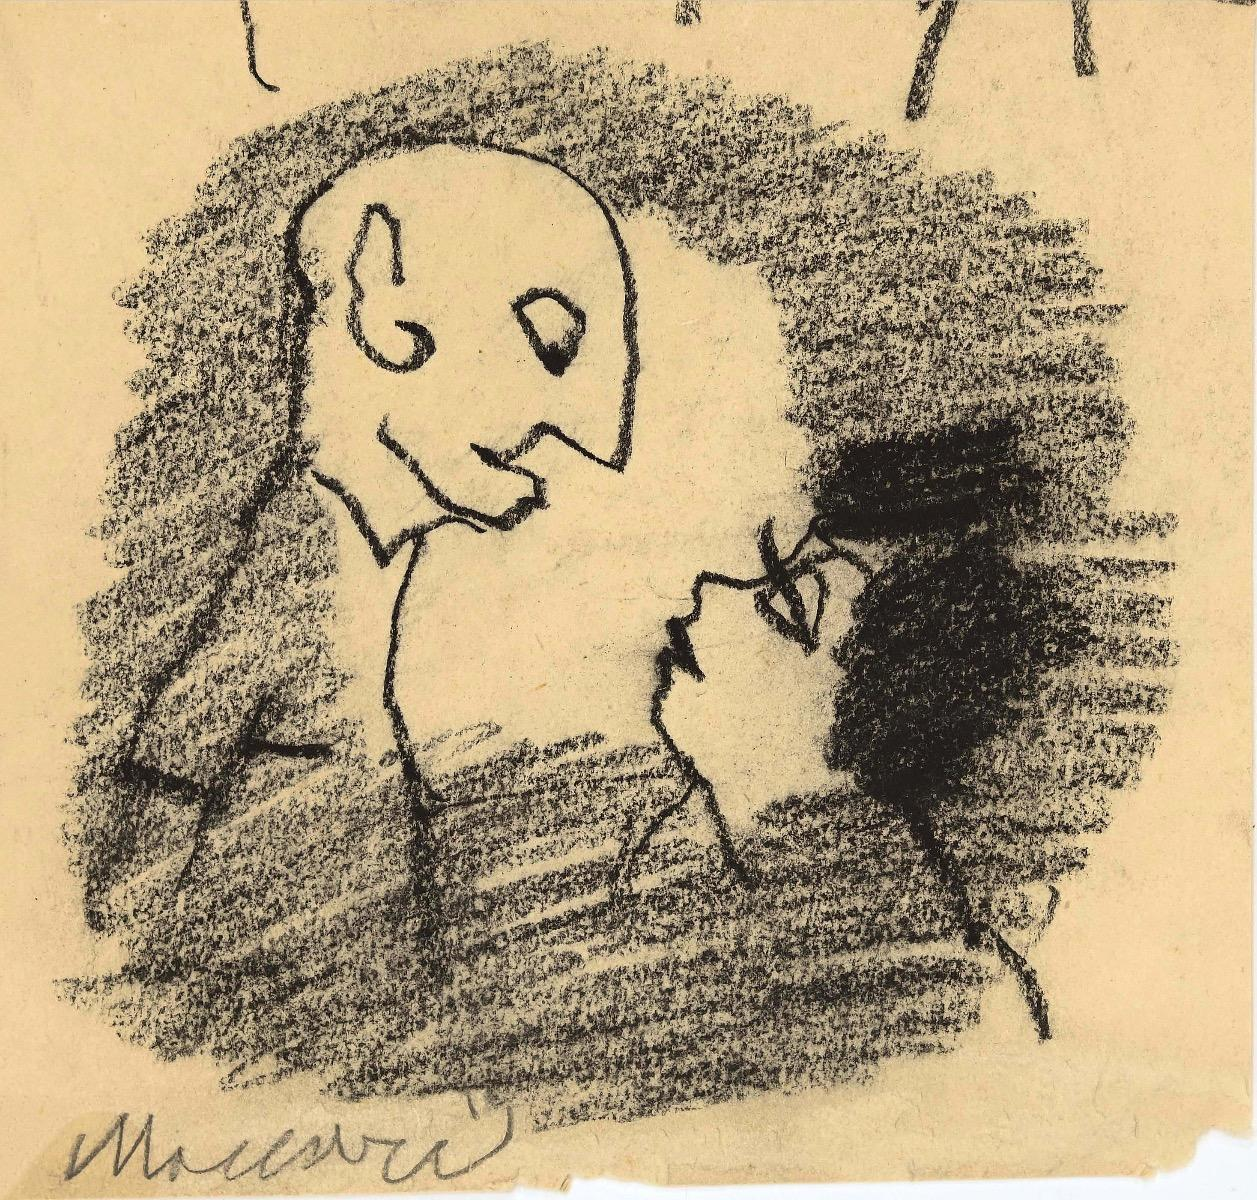 Couple - Original Charcoal by Mino Maccari - 1960s